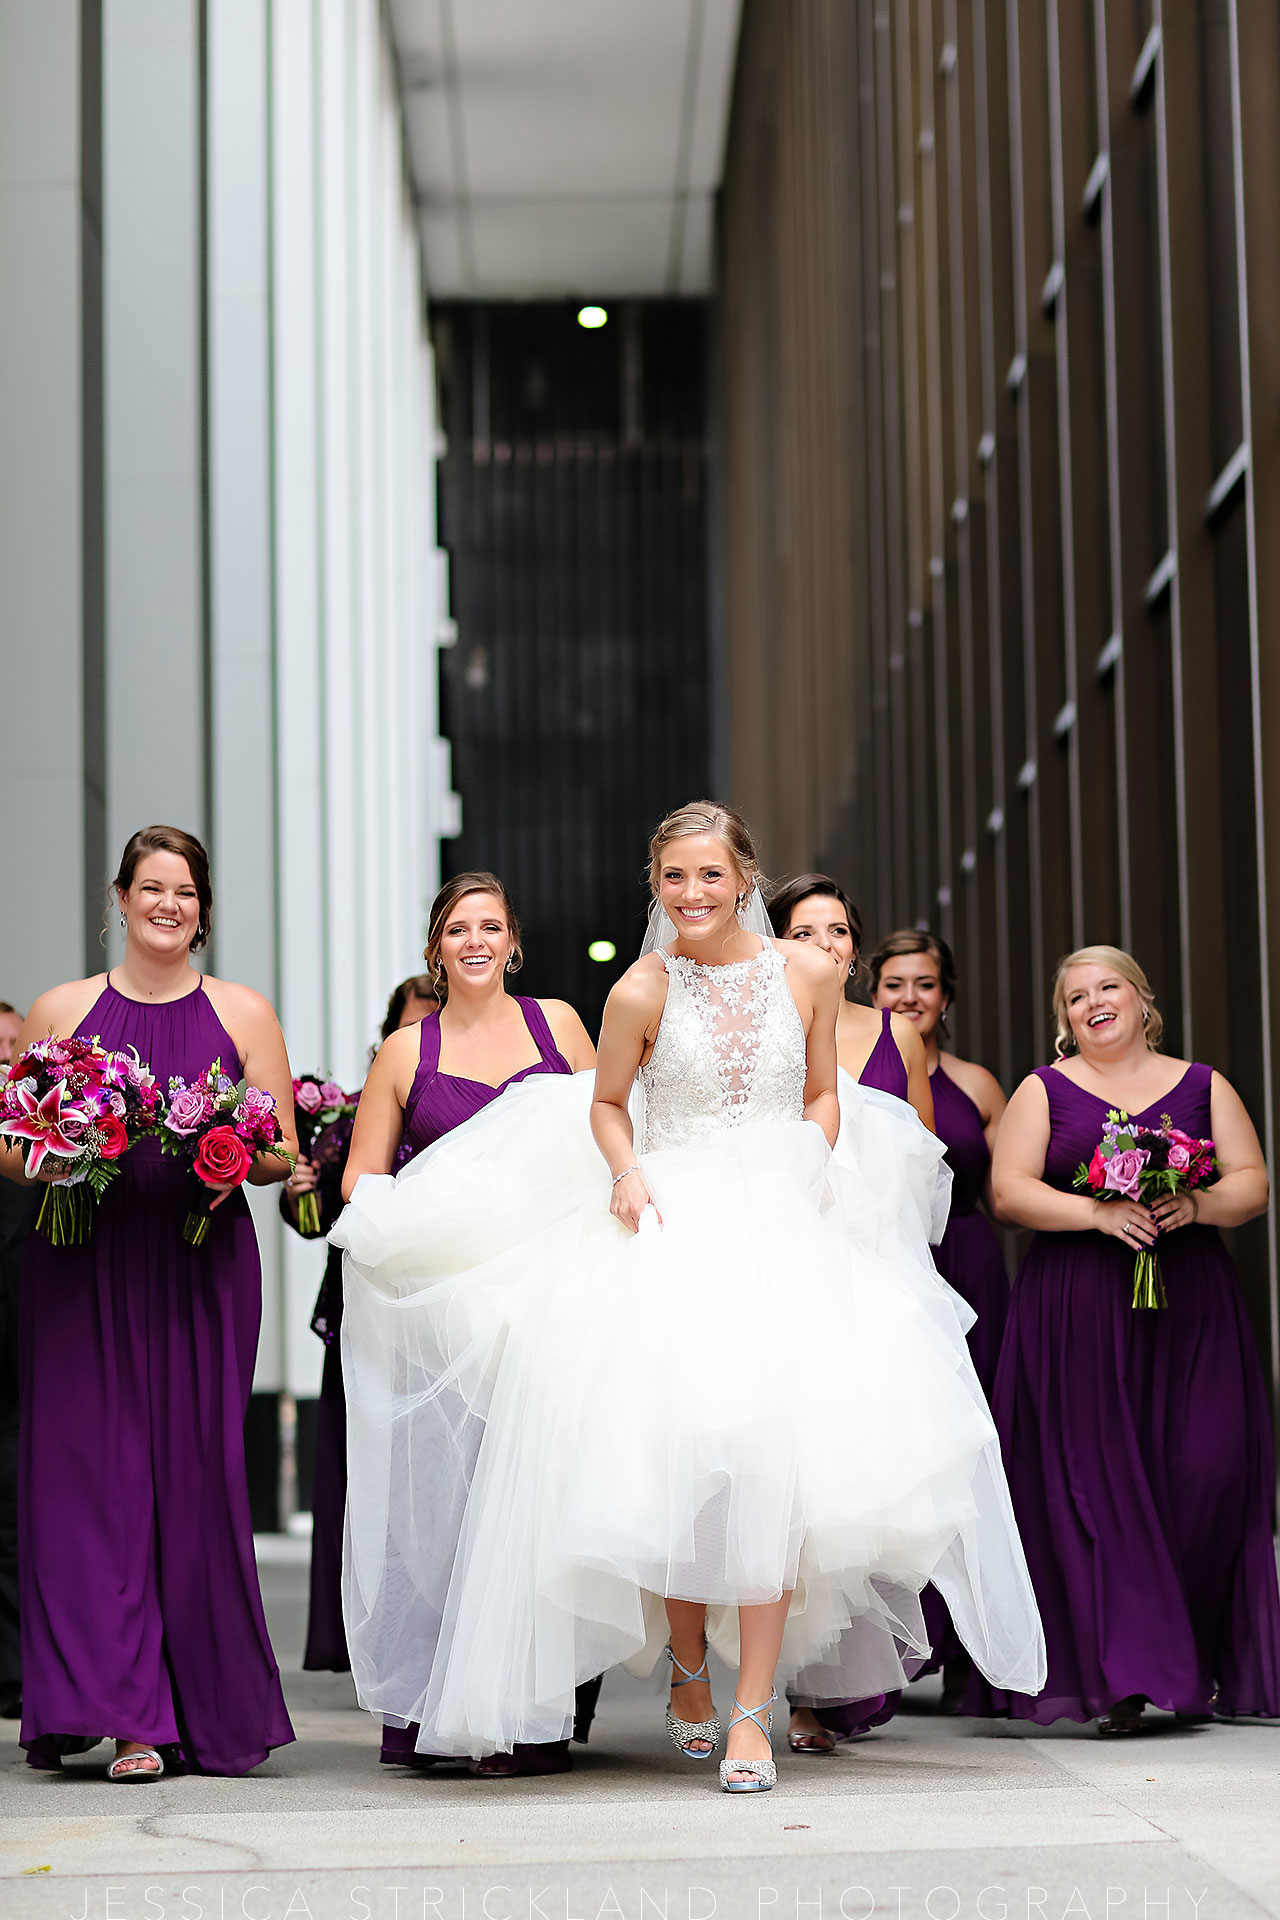 Serra Alex Regions Tower Indianapolis Wedding 079 watermarked